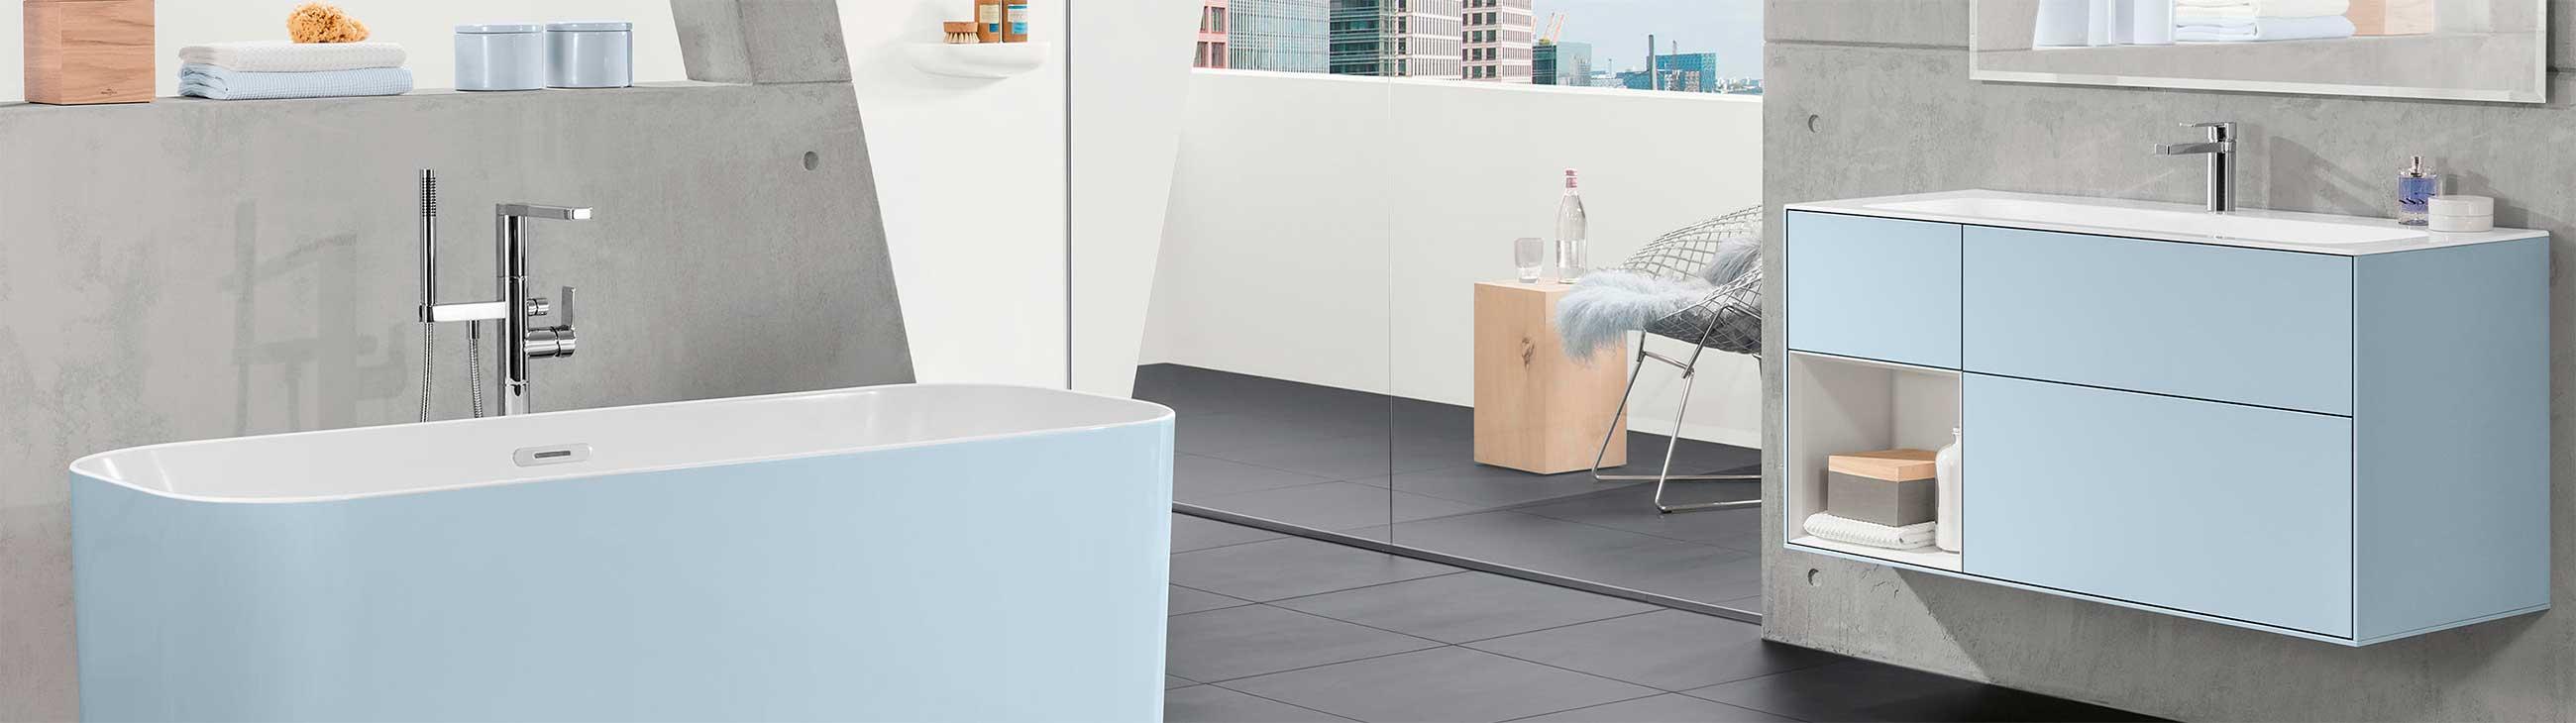 Moderne baderomsmøbler med praktiske løsninger